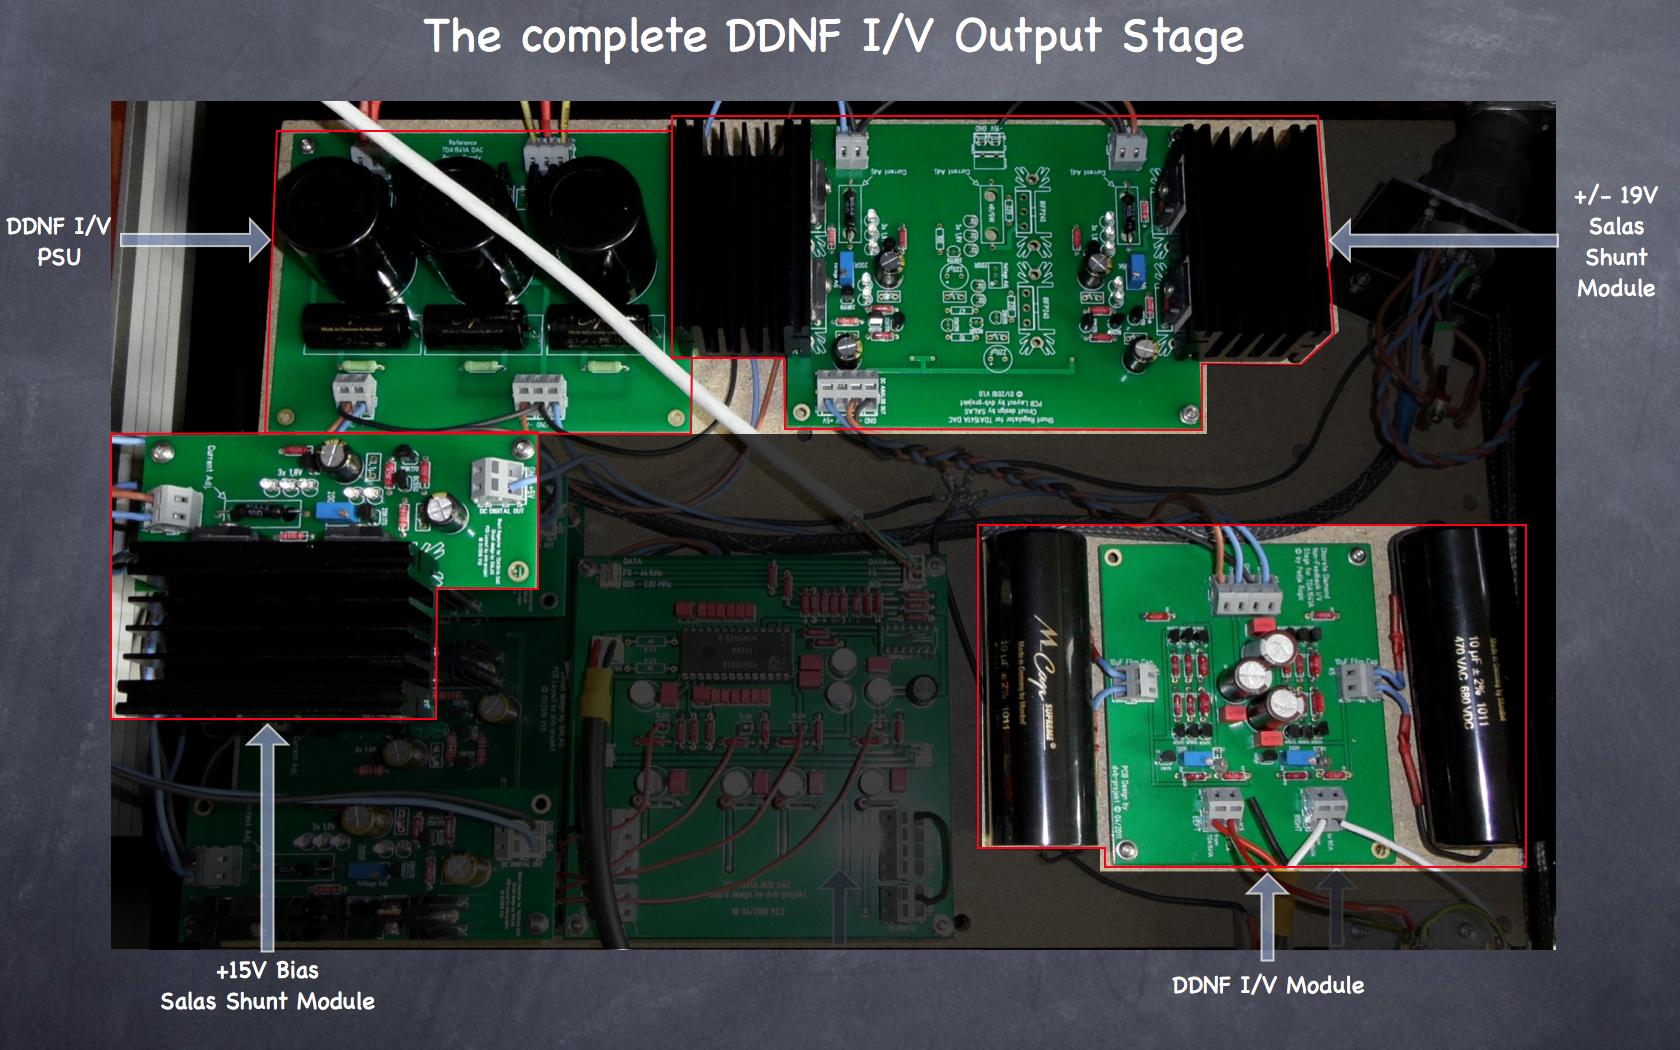 Complete_DDNF_I:V_Output_Stage